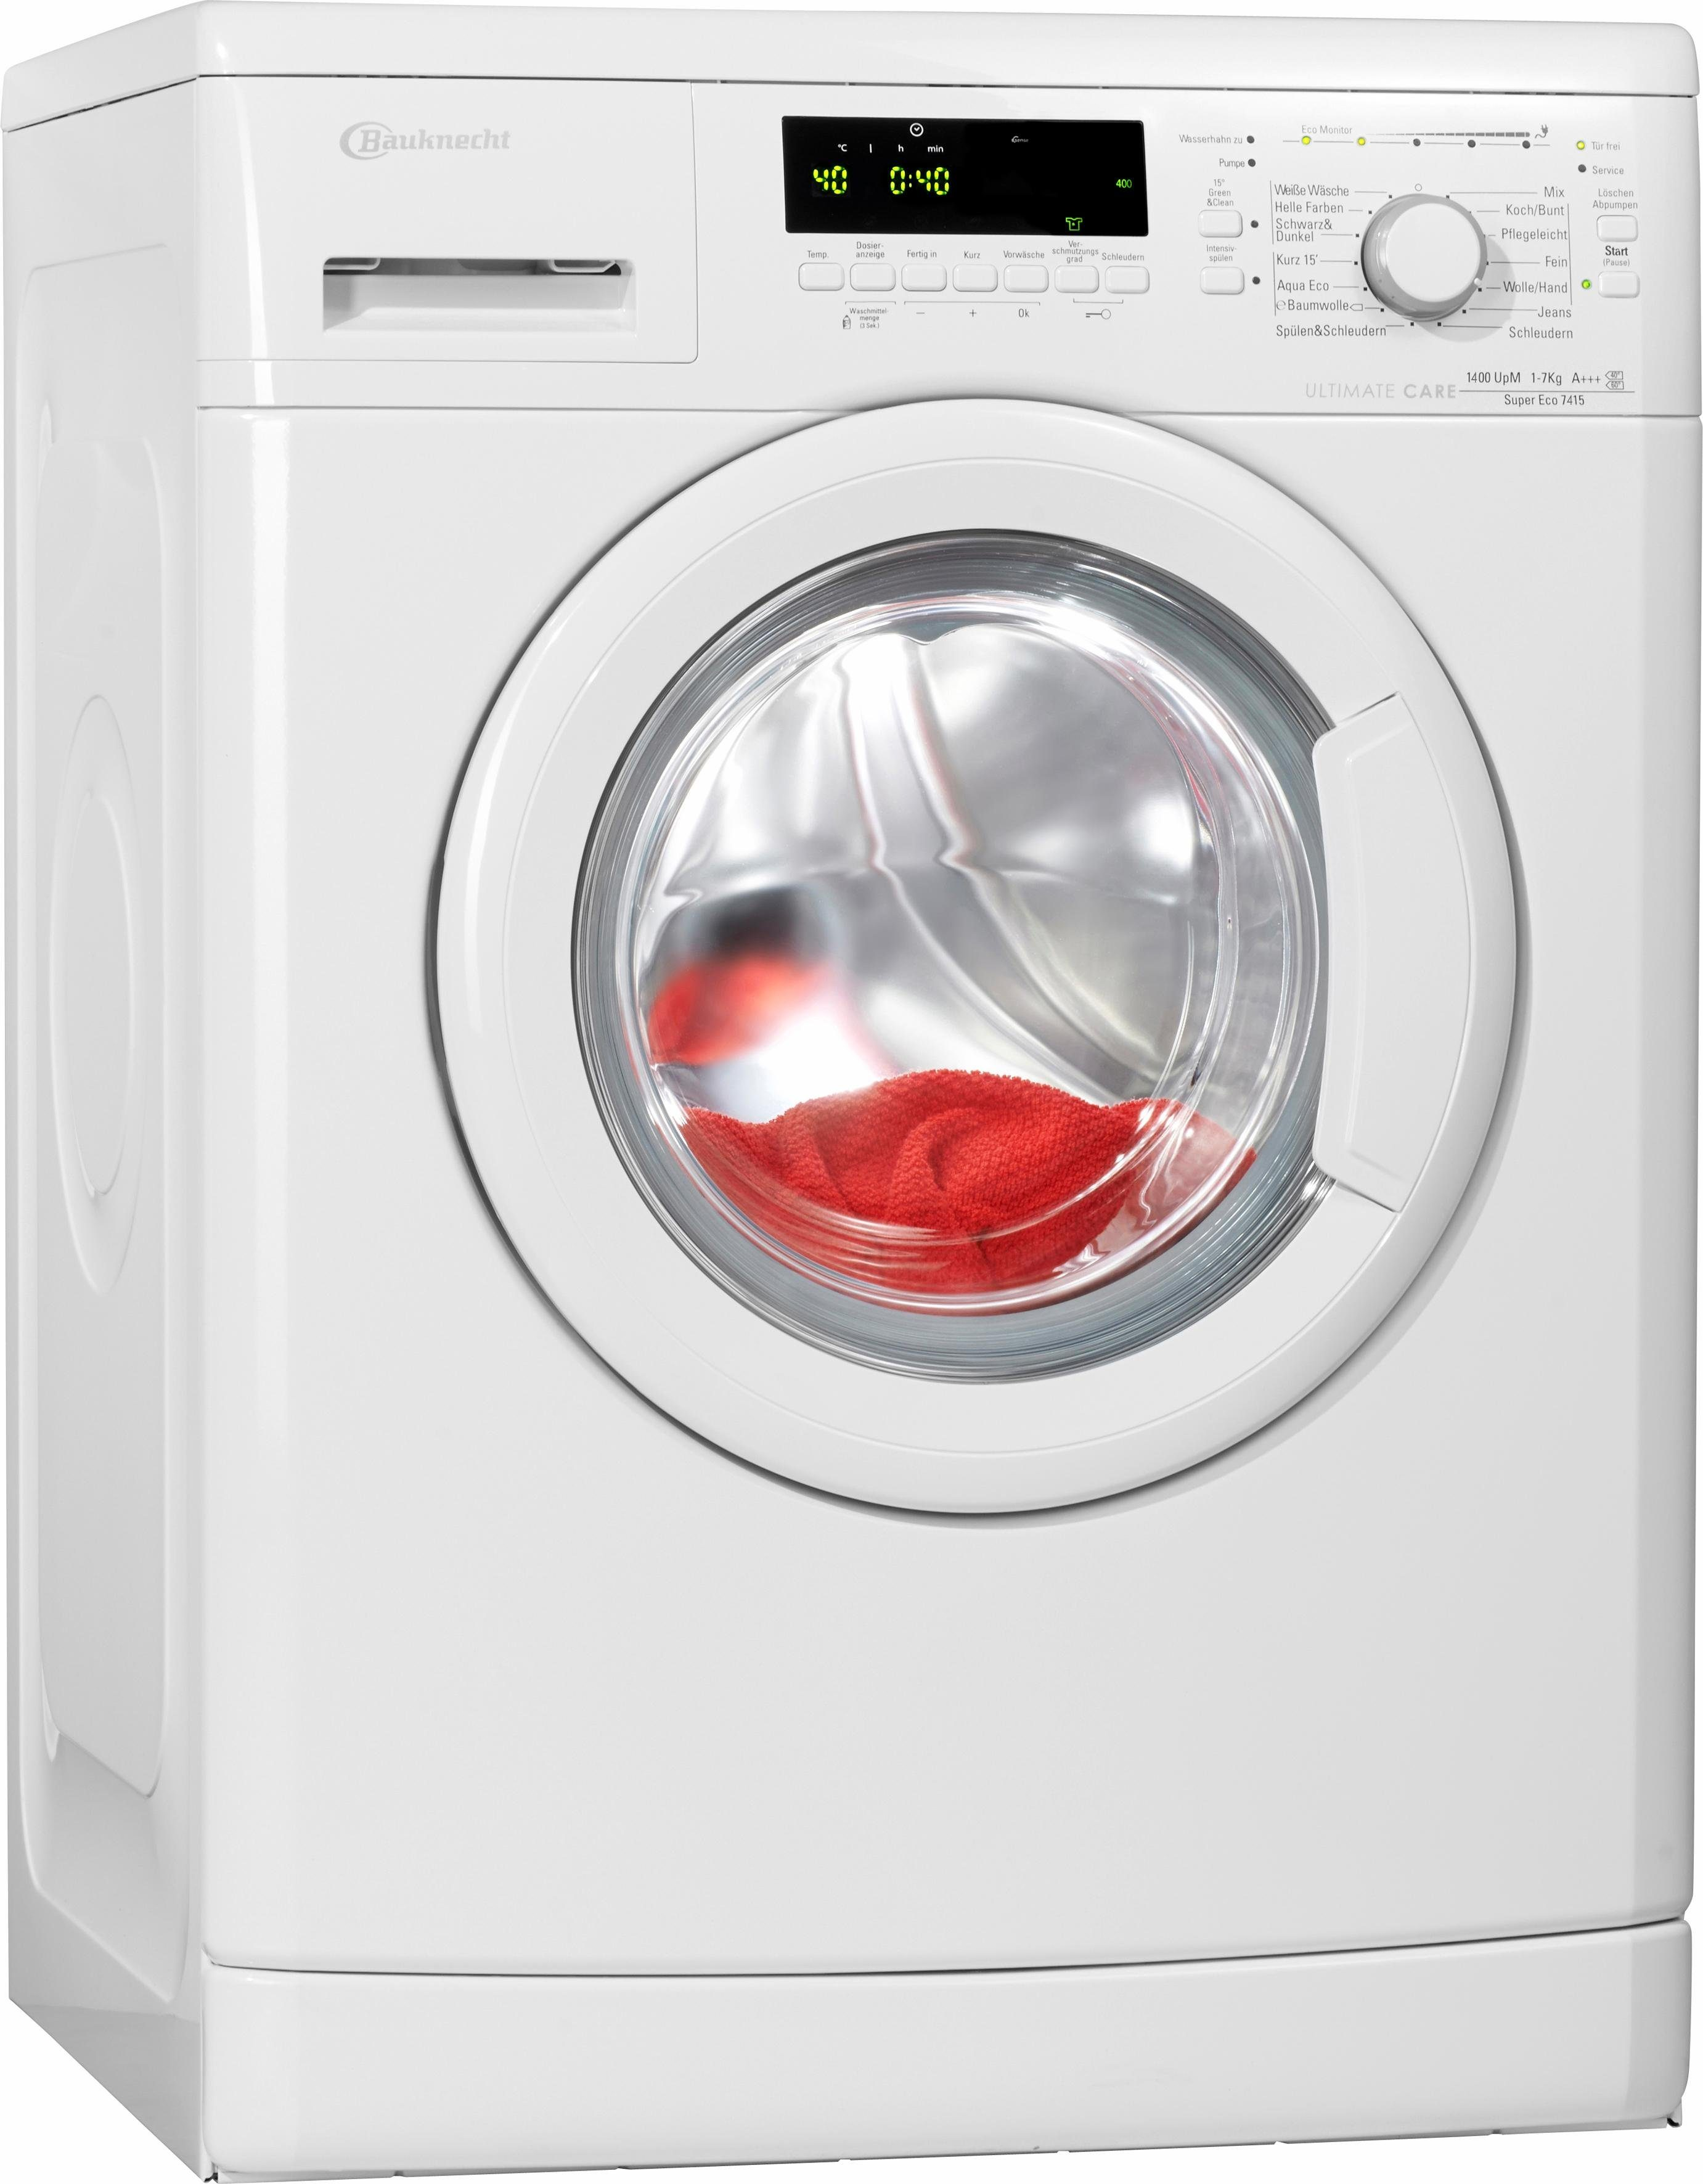 BAUKNECHT Waschmaschine Super Eco 7415, 7 kg, 1400 U/Min